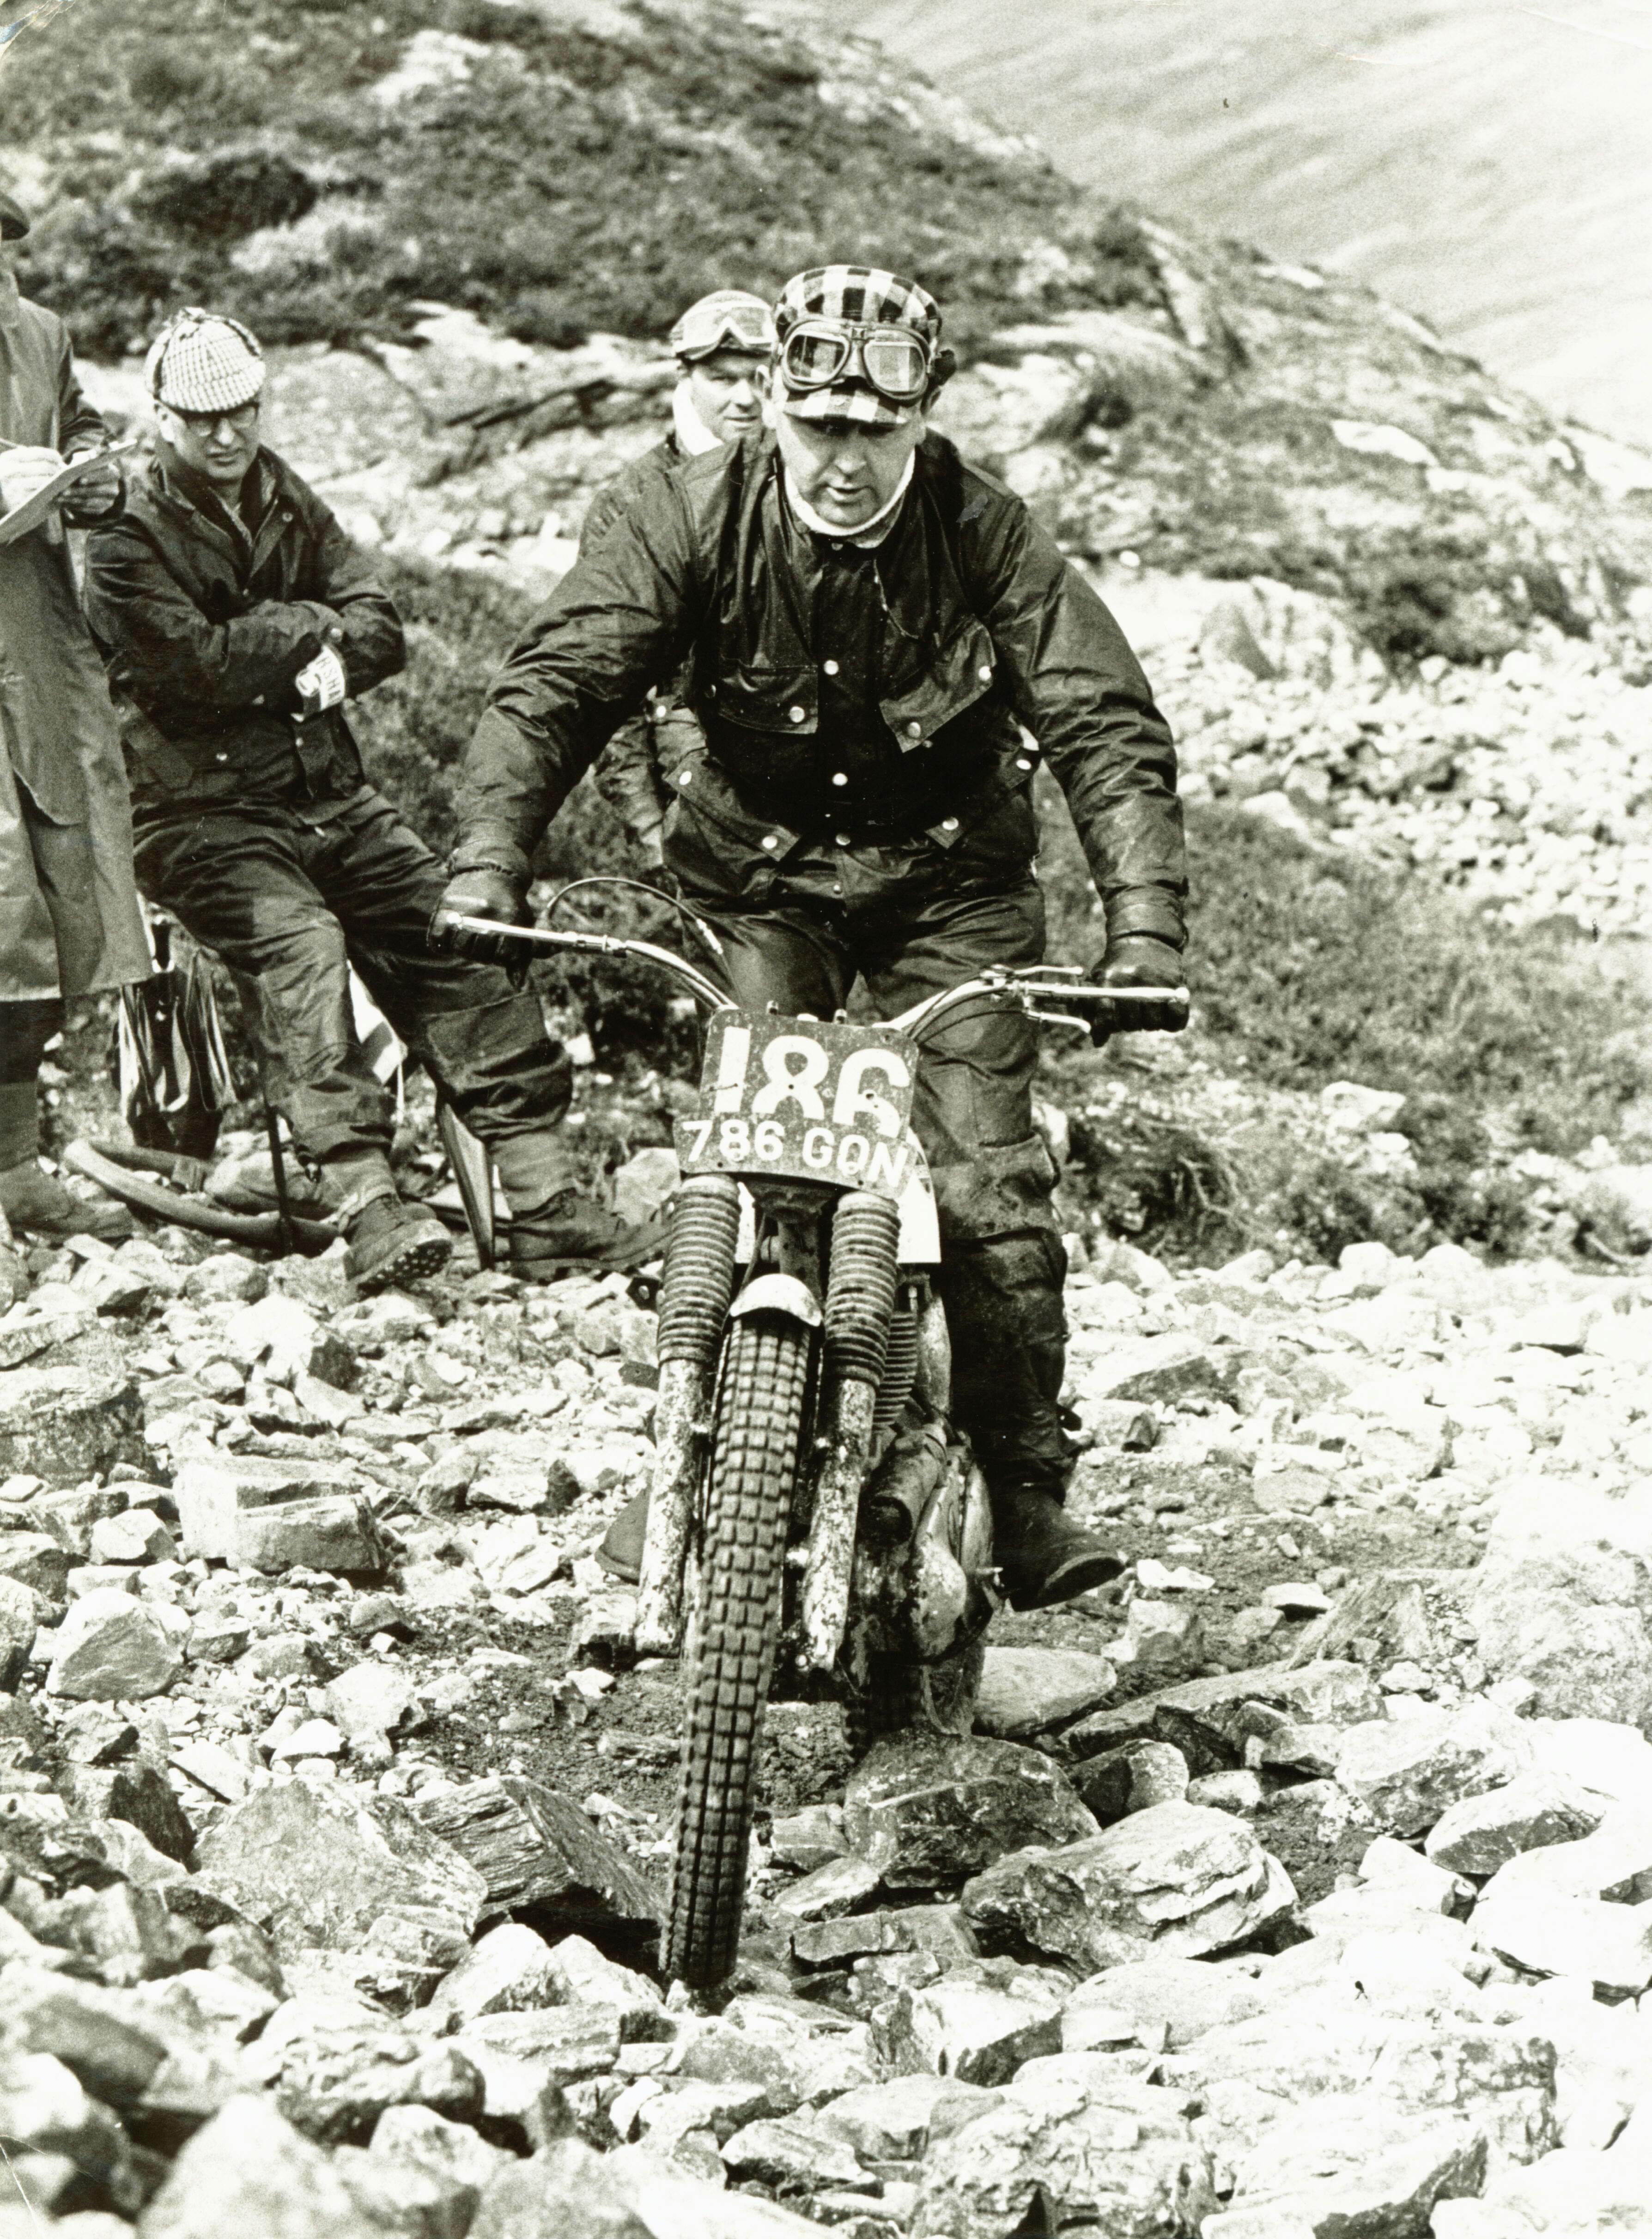 1965 Scottish Six Days - Ariel 786GON